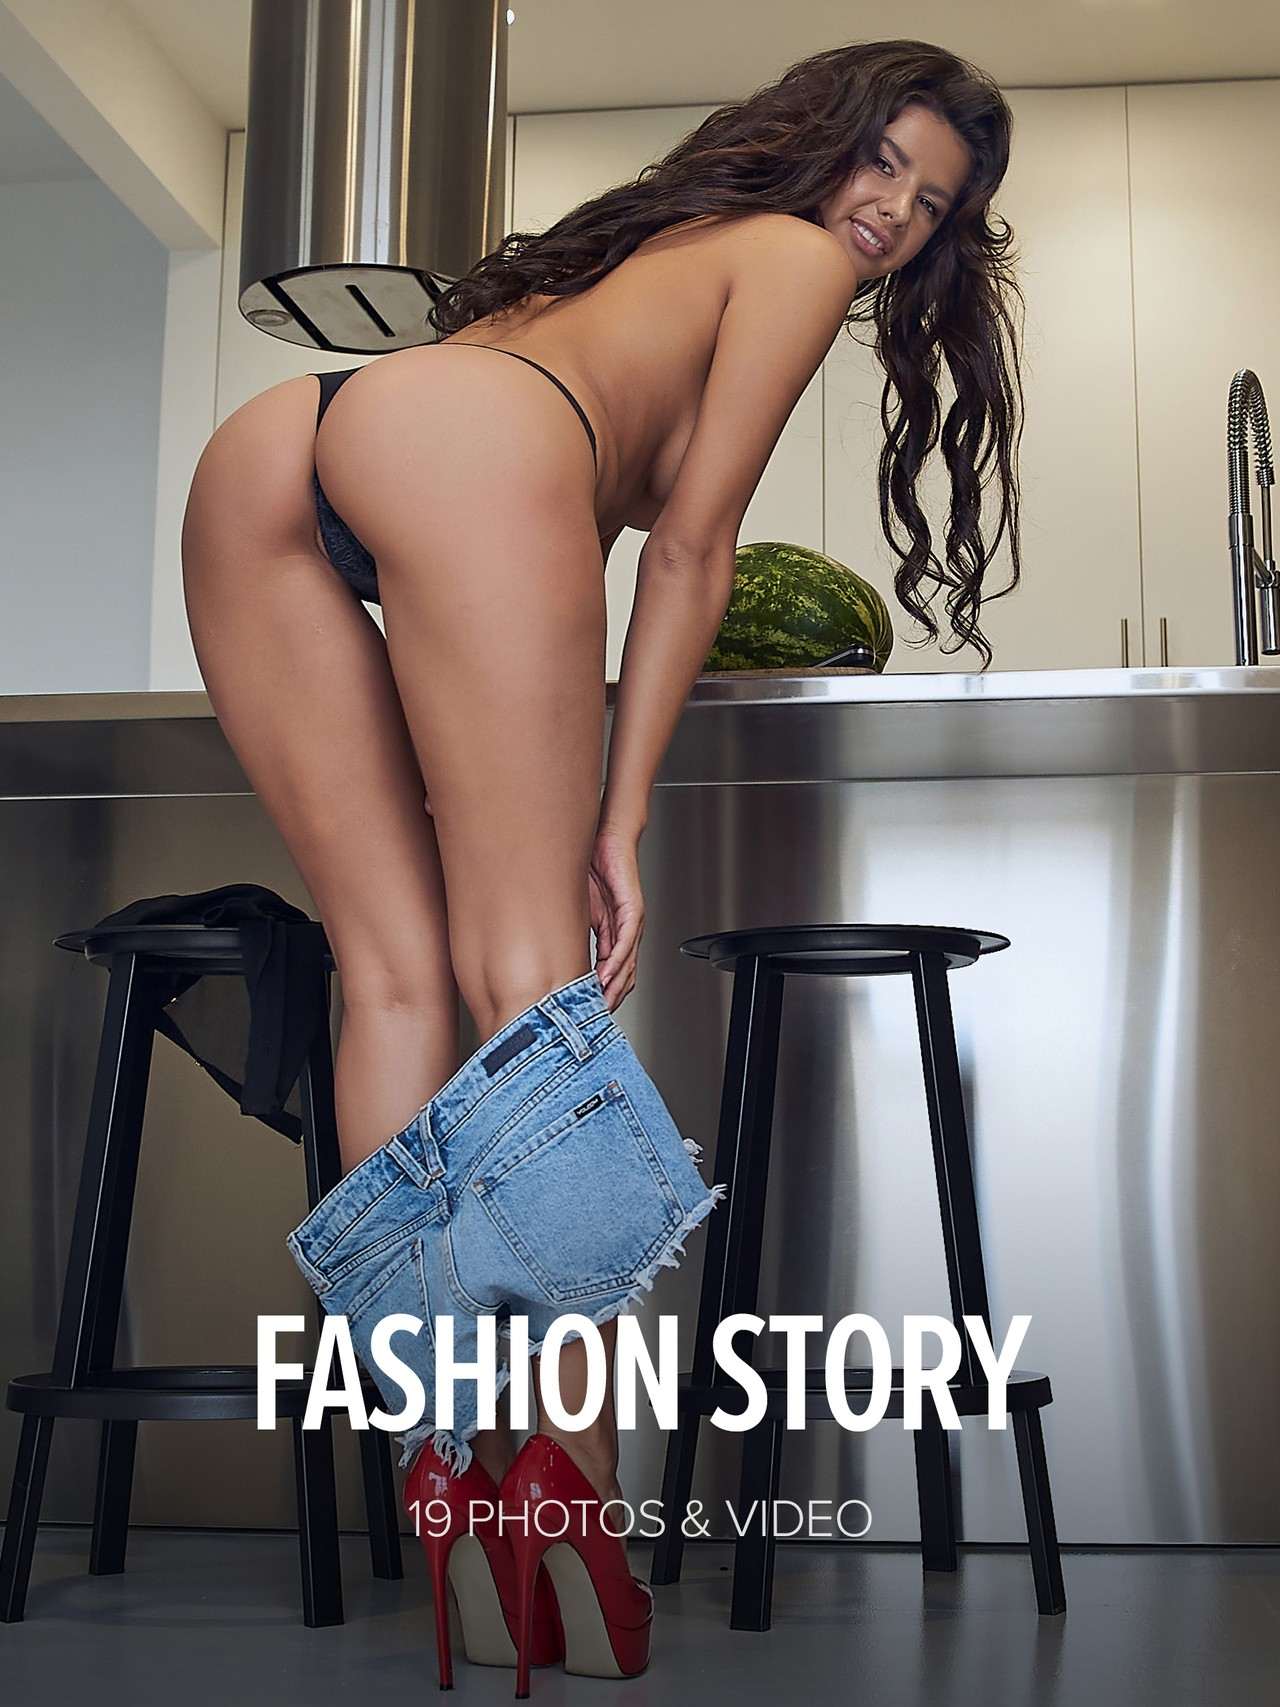 Nadia: Fashion Story